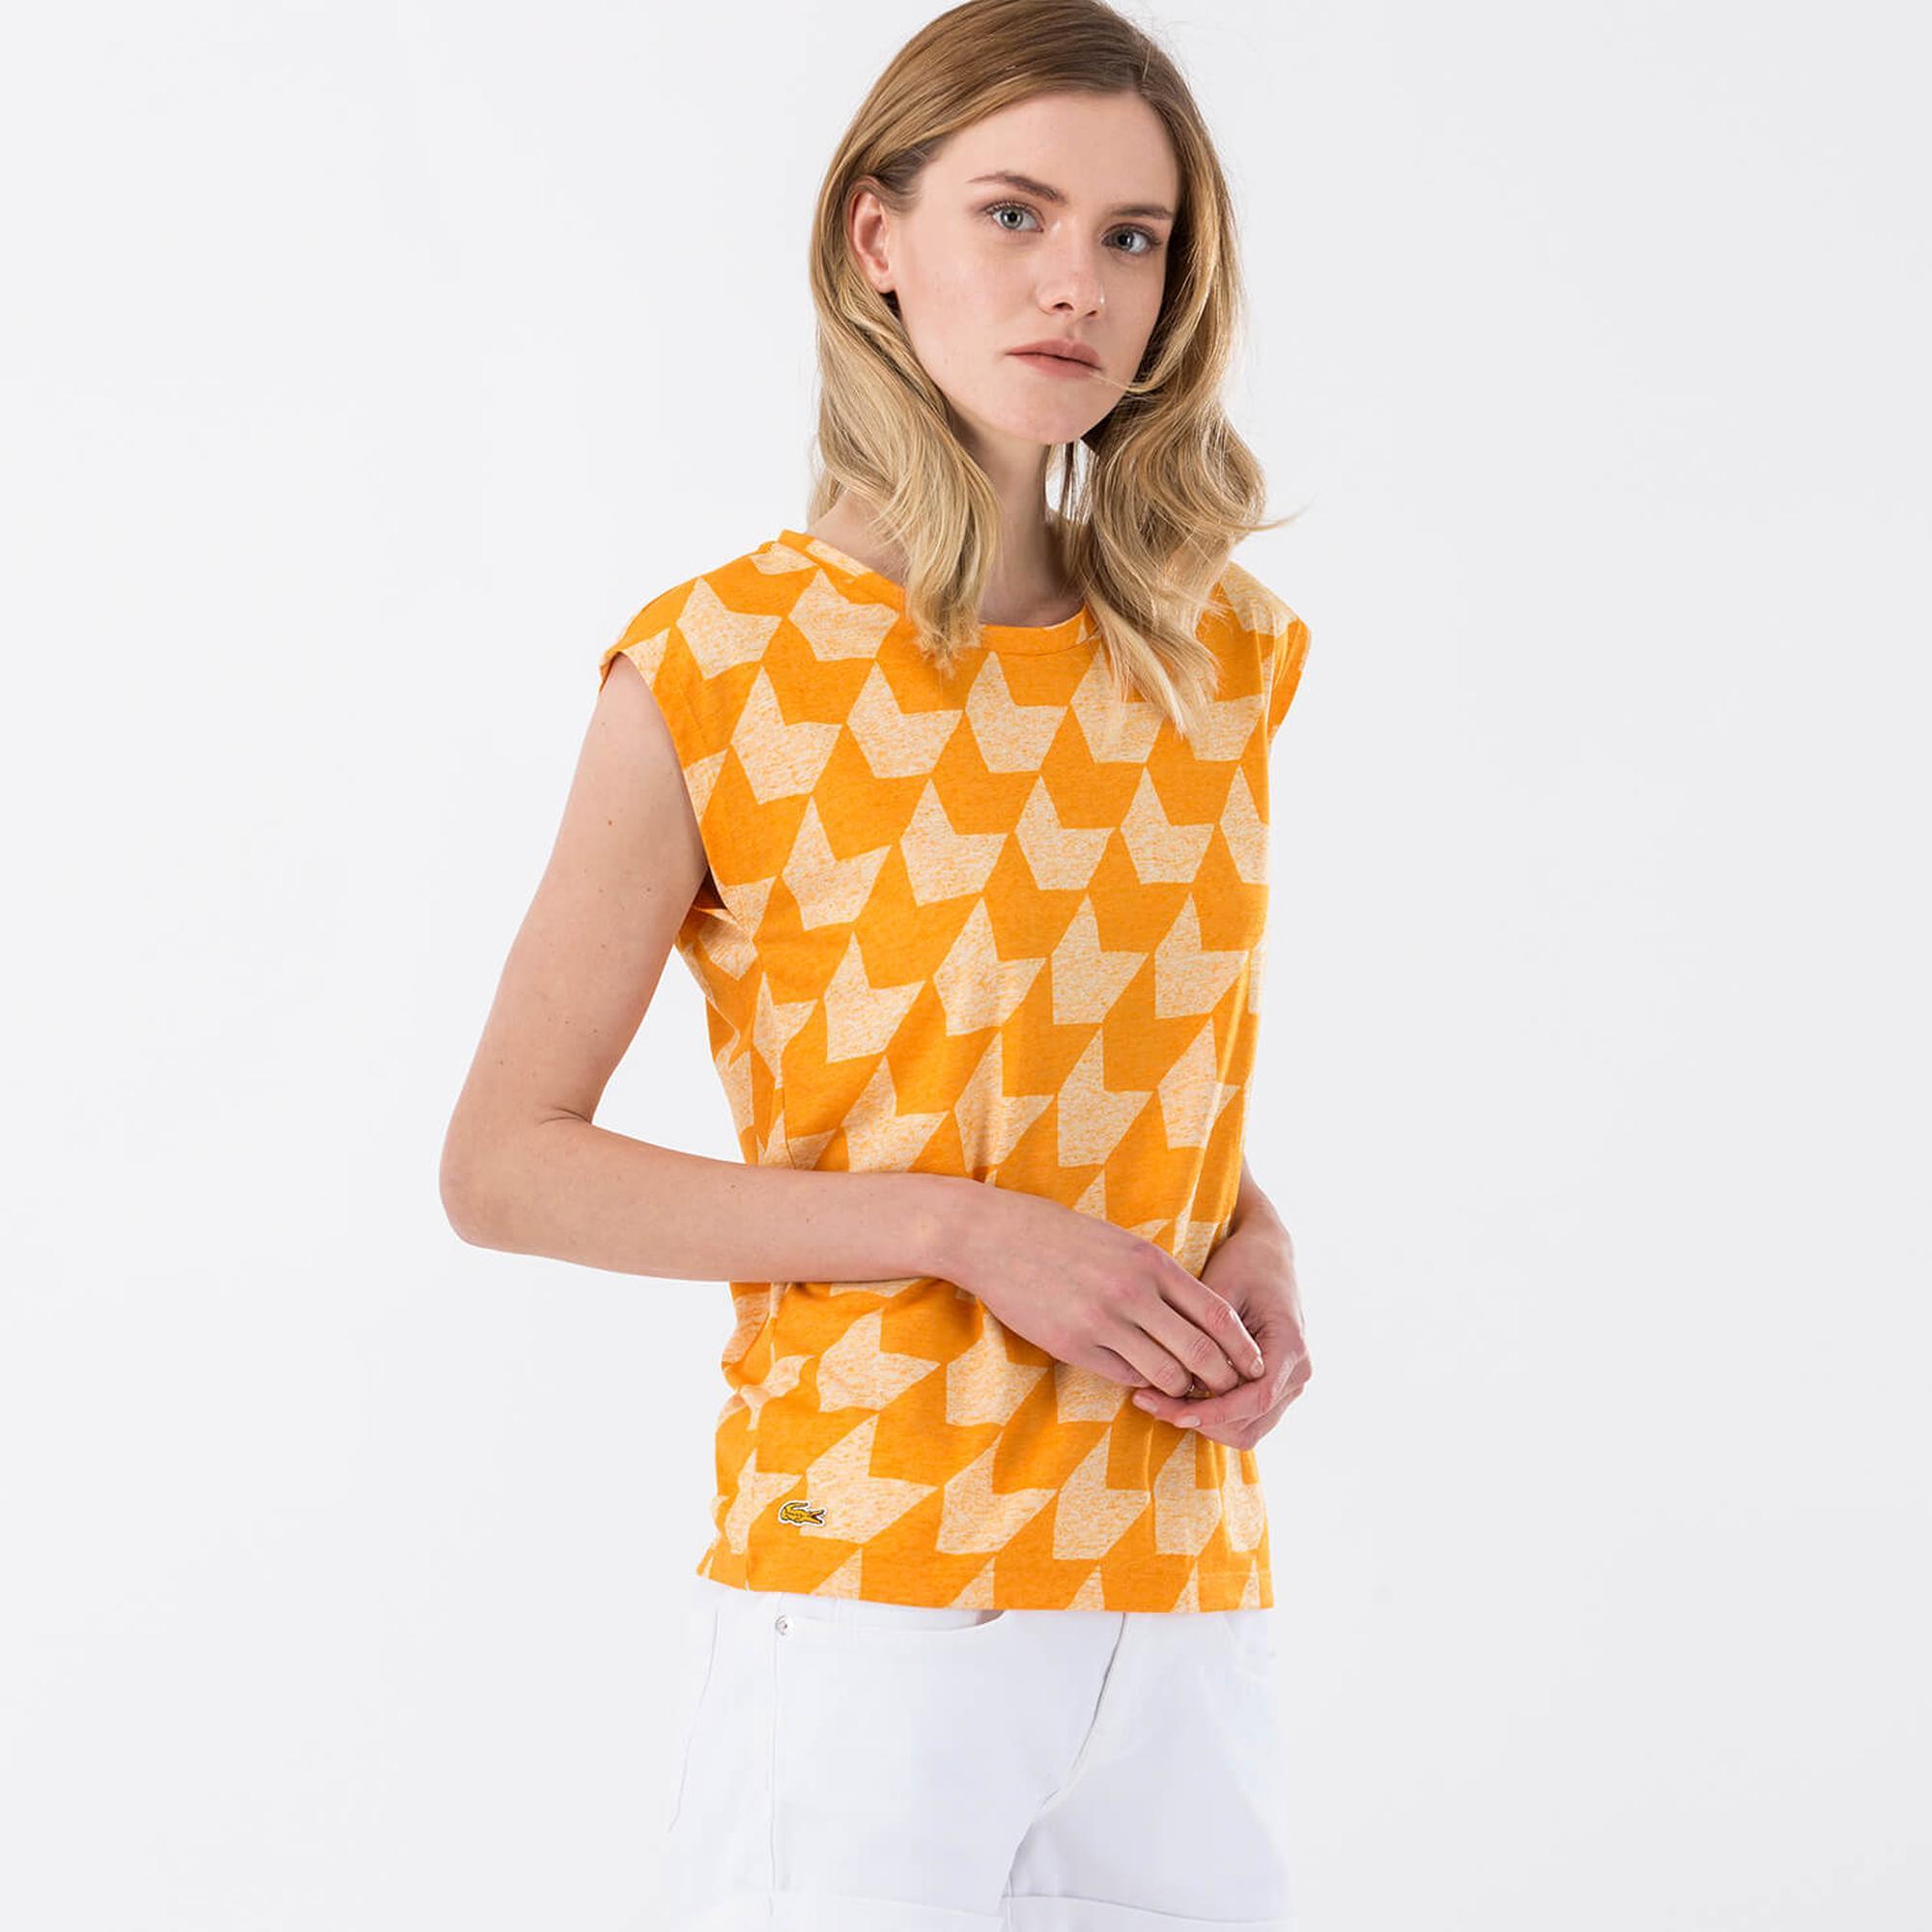 Lacoste Women's Crew neck t-shirt